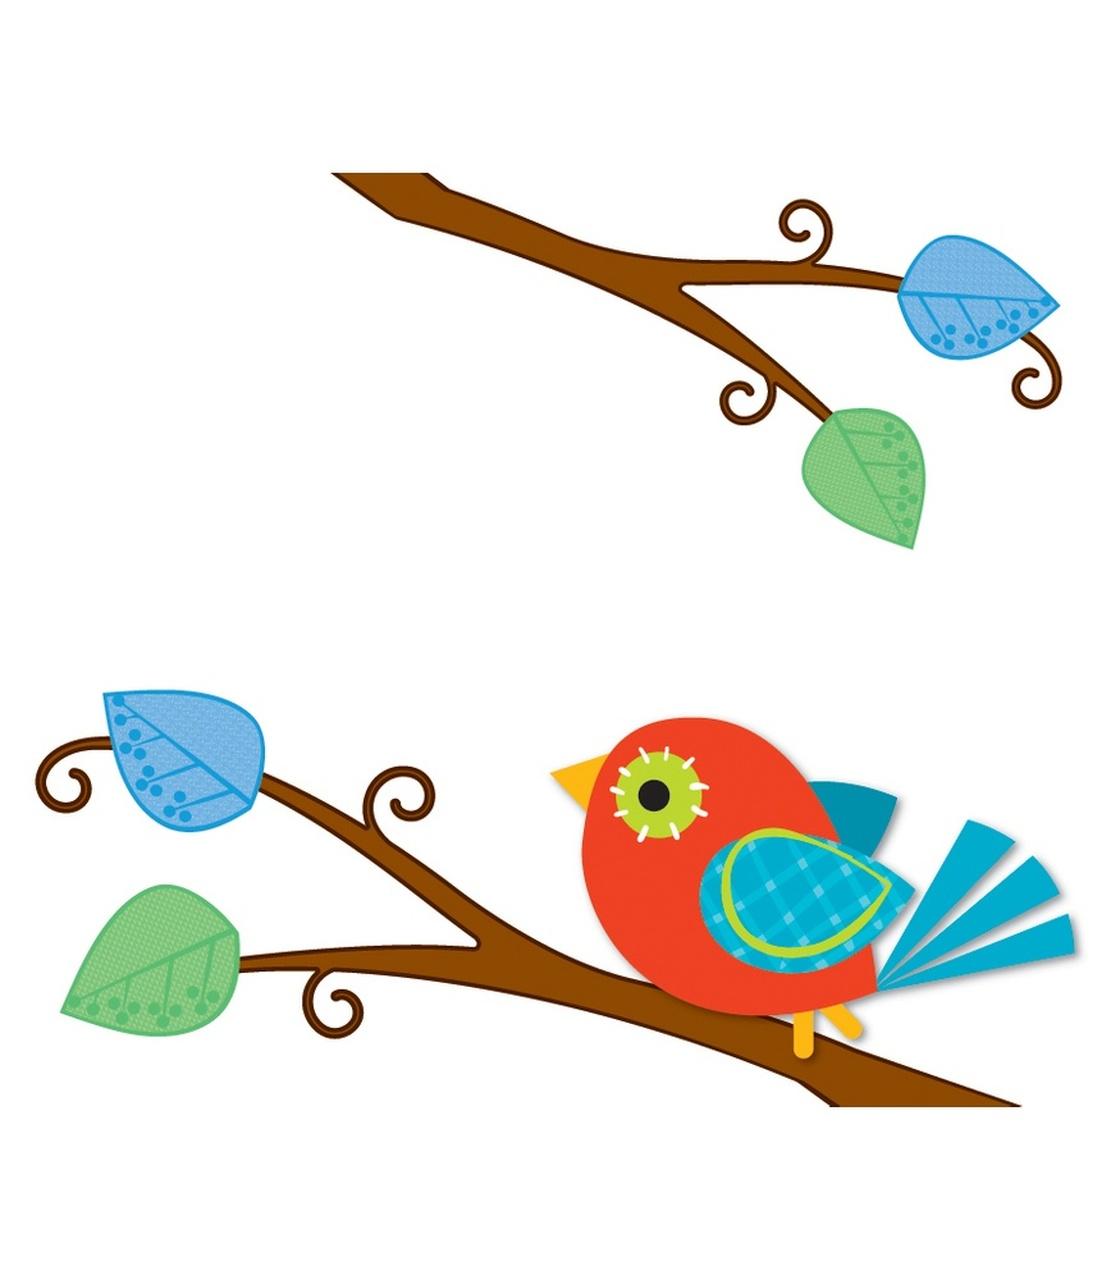 Boho bird clipart banner royalty free download Boho Birds Name Tags banner royalty free download